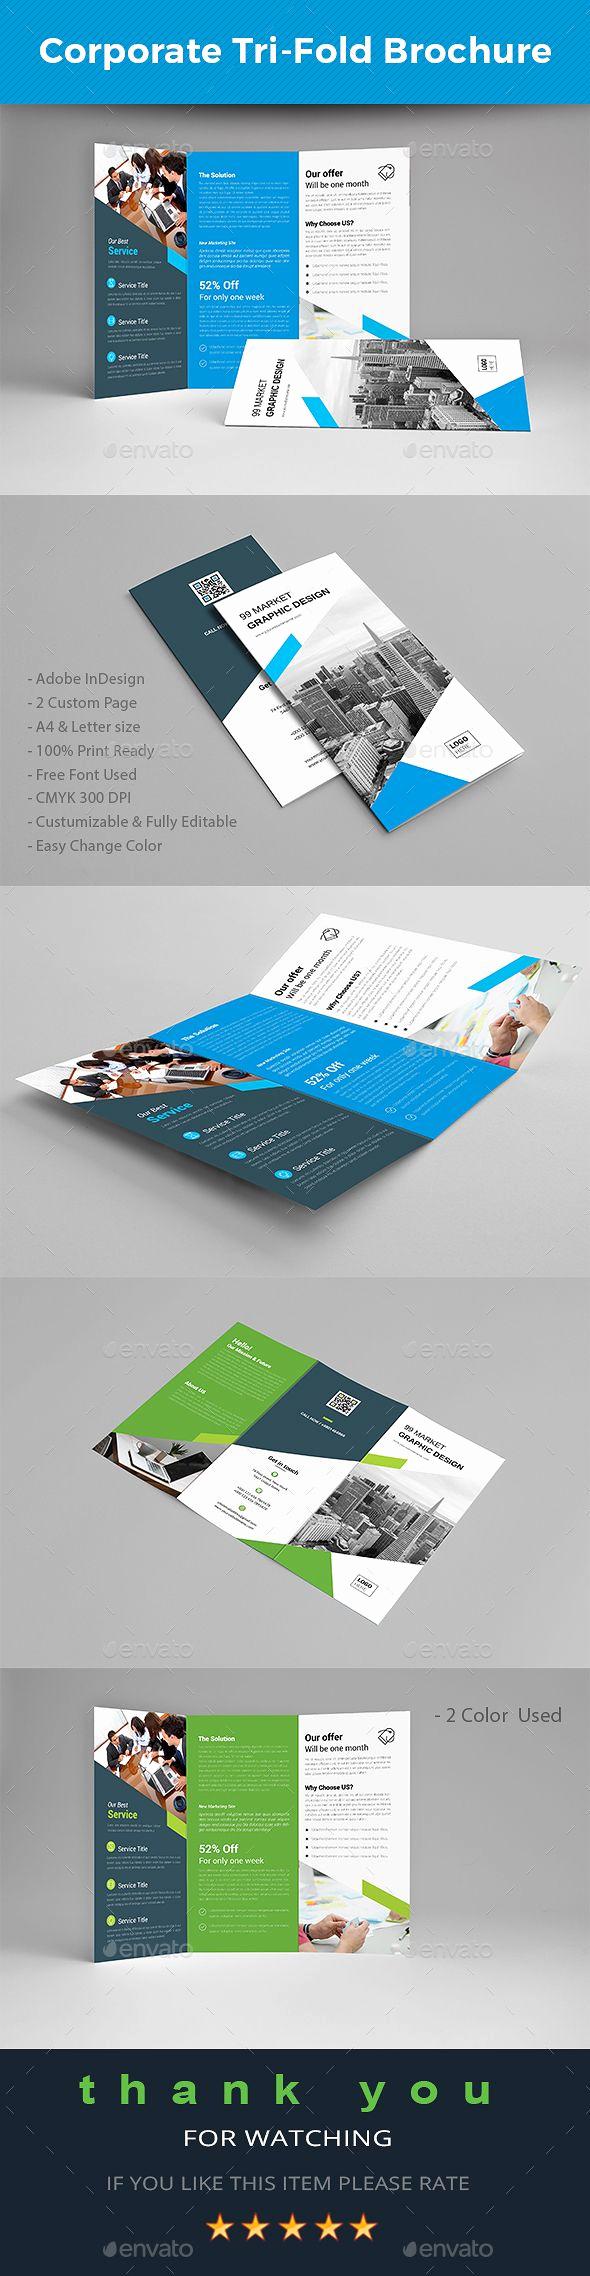 Tri Fold Brochure Size Fresh Letter Size Tri Fold Brochure Template Gallery